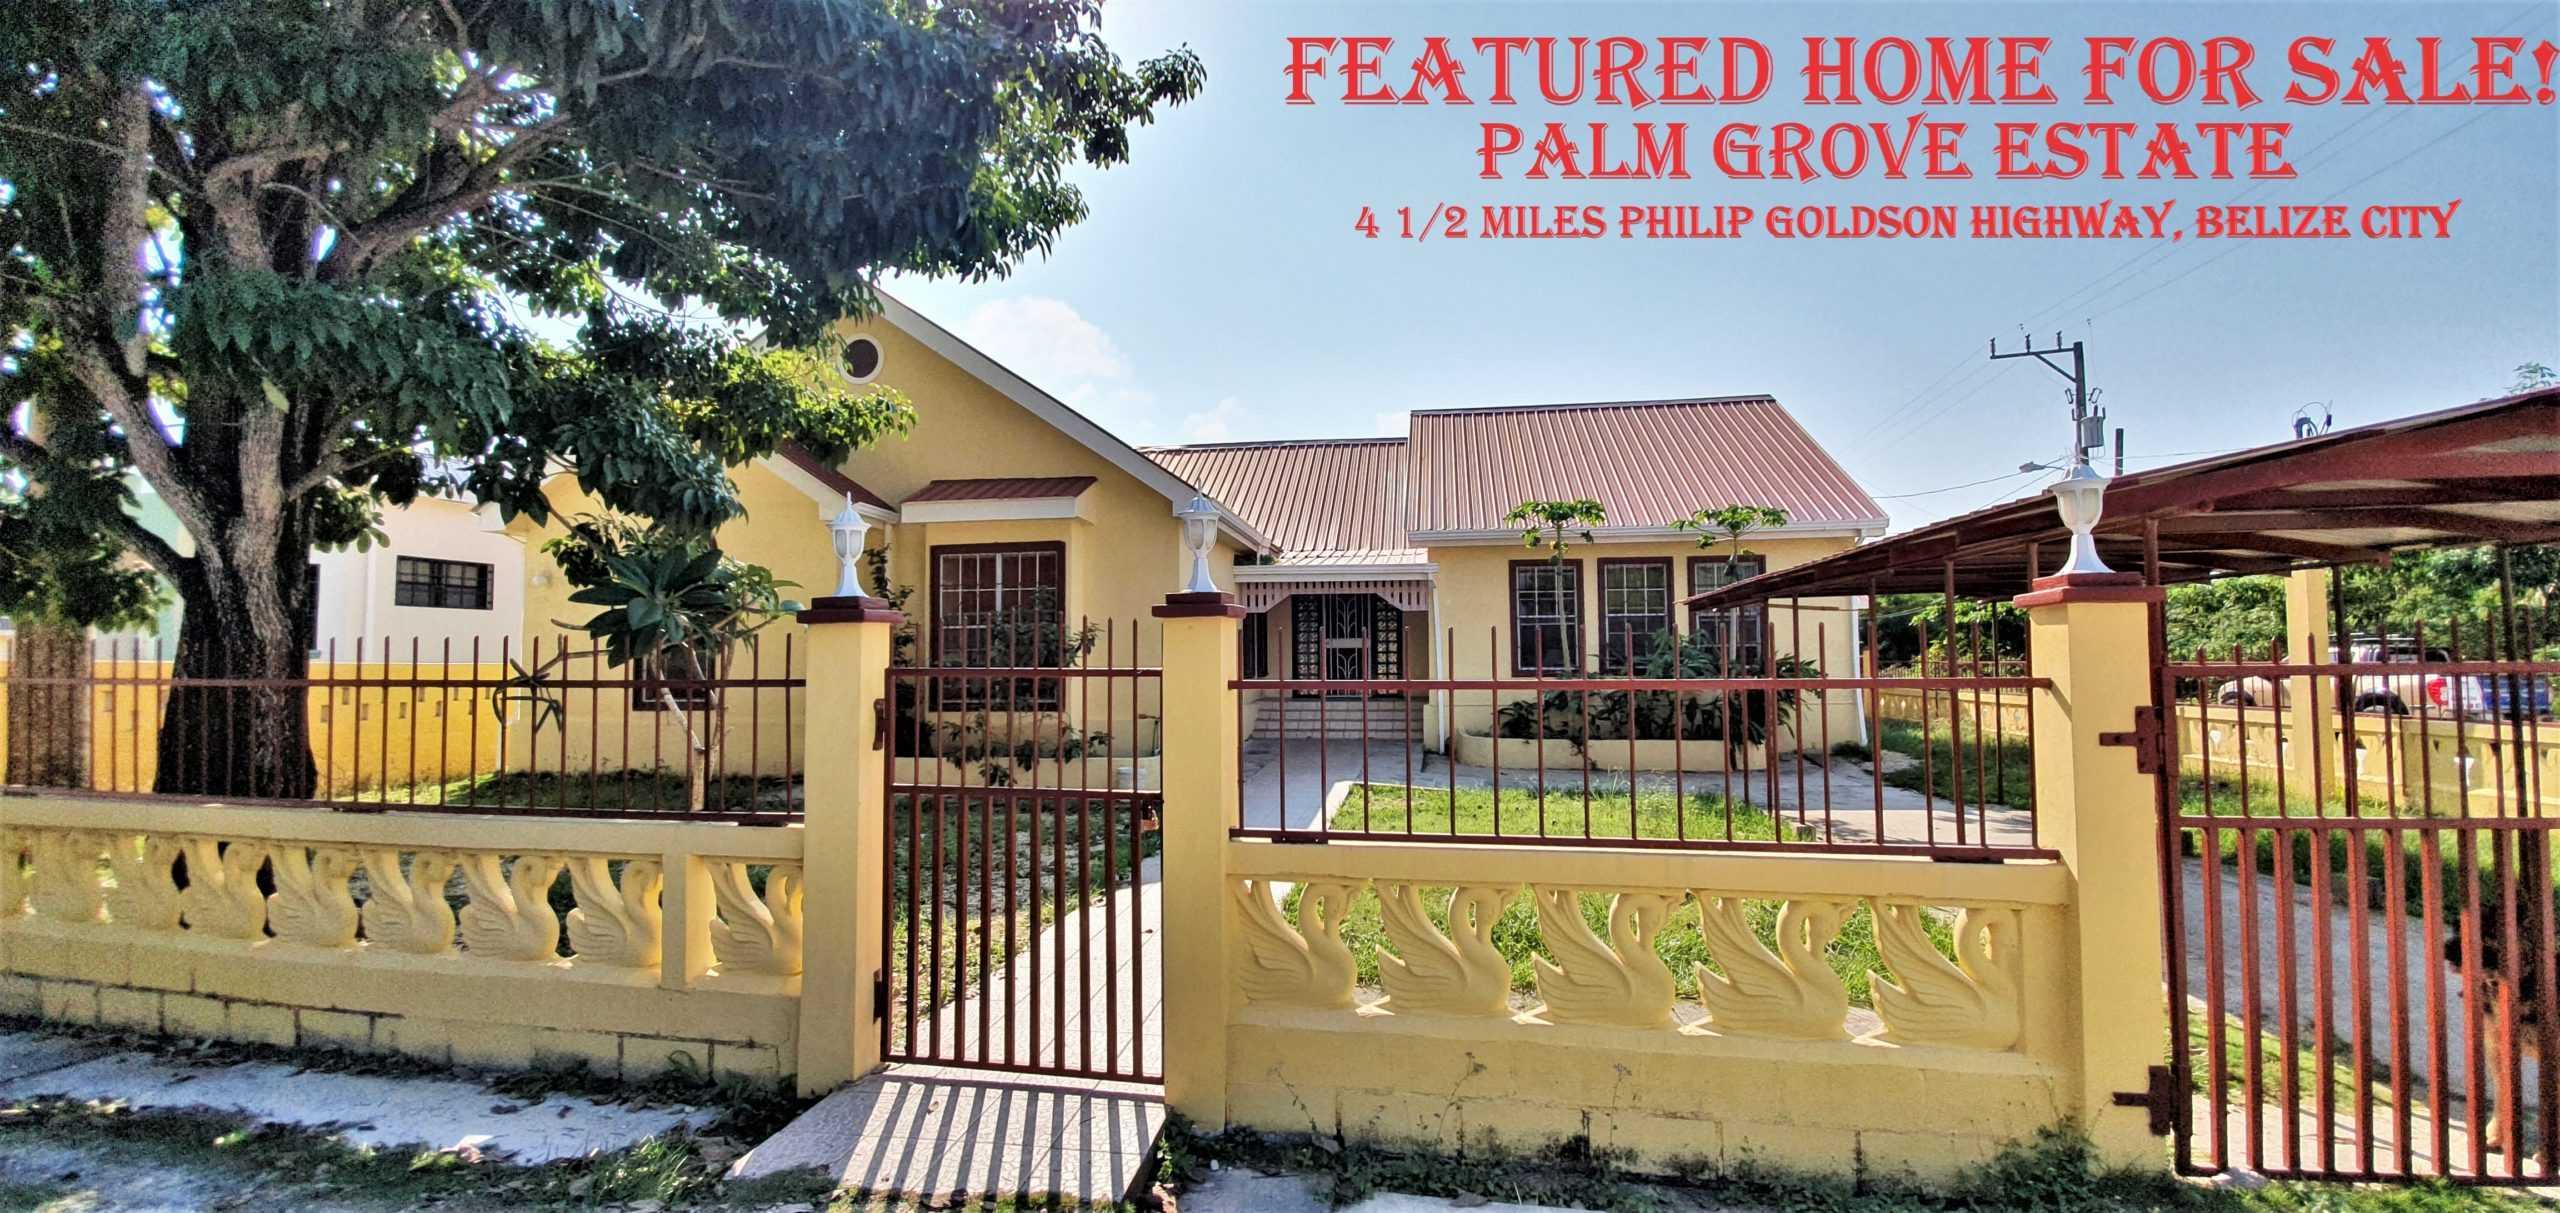 BZ153: 5 Bedroom Bungalow Home on Large Corner Lot in Palm Grove Estate, Belize…